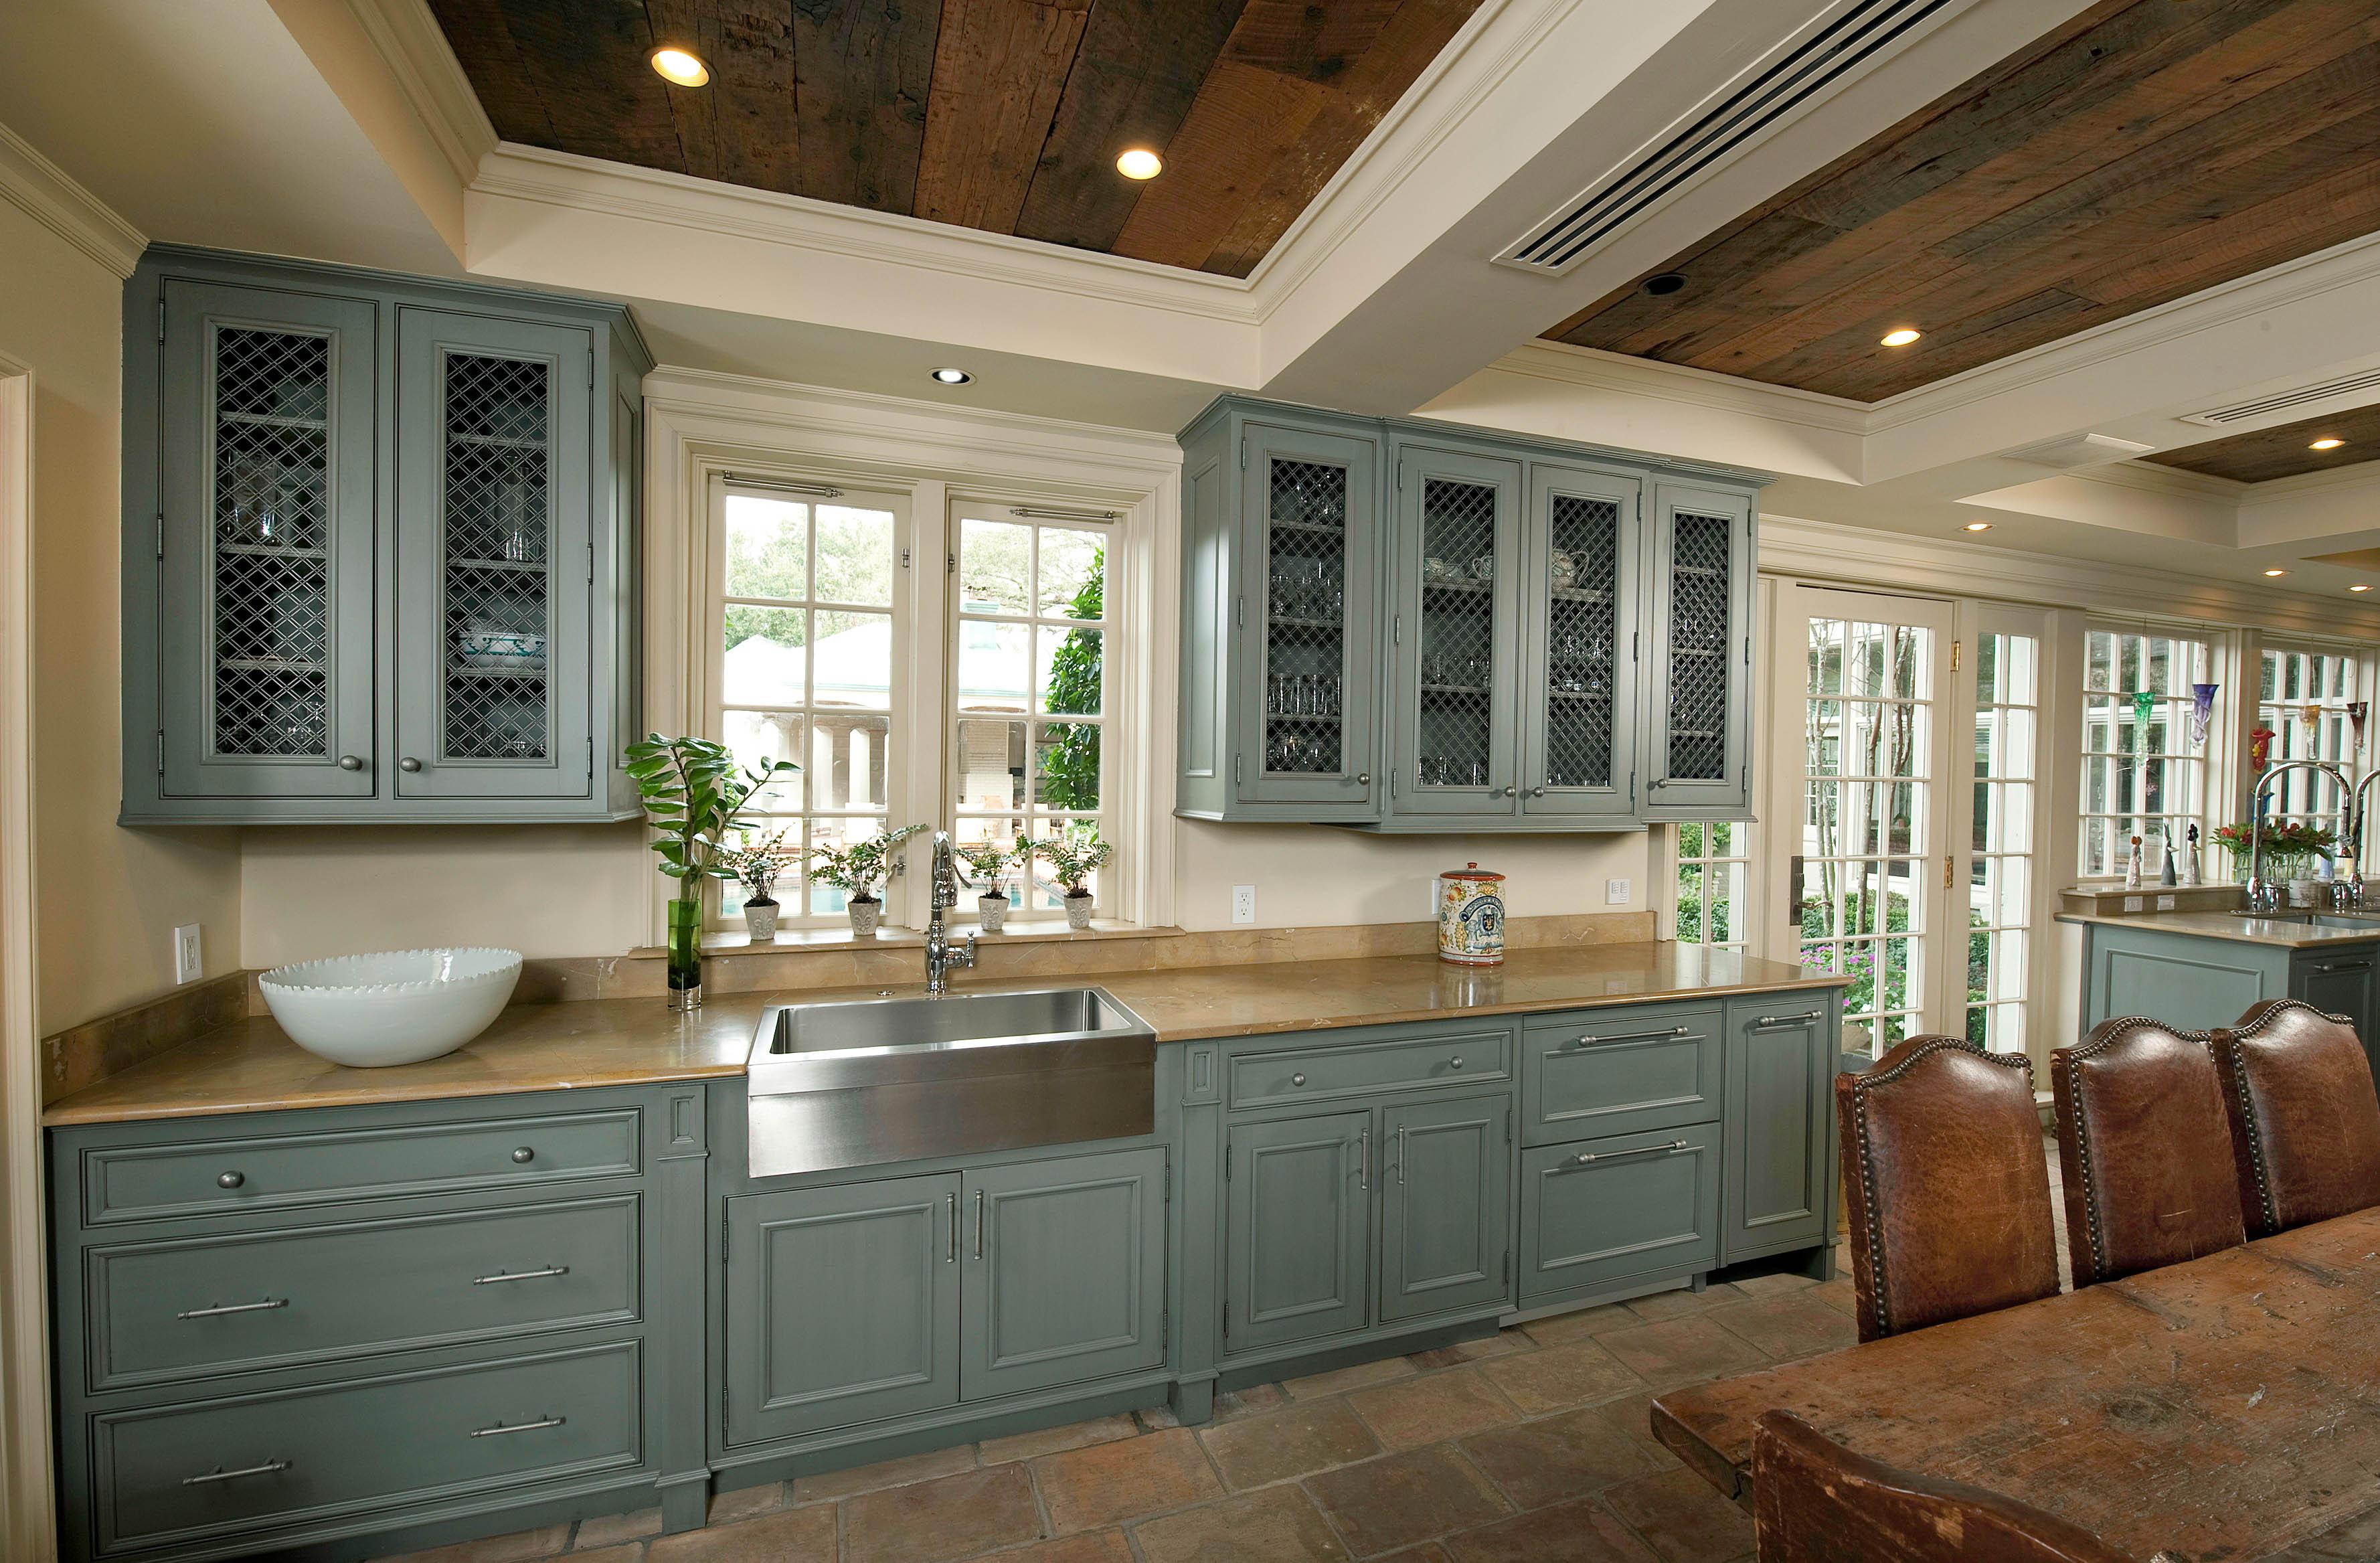 Old Metairie Kitchen_8753 130